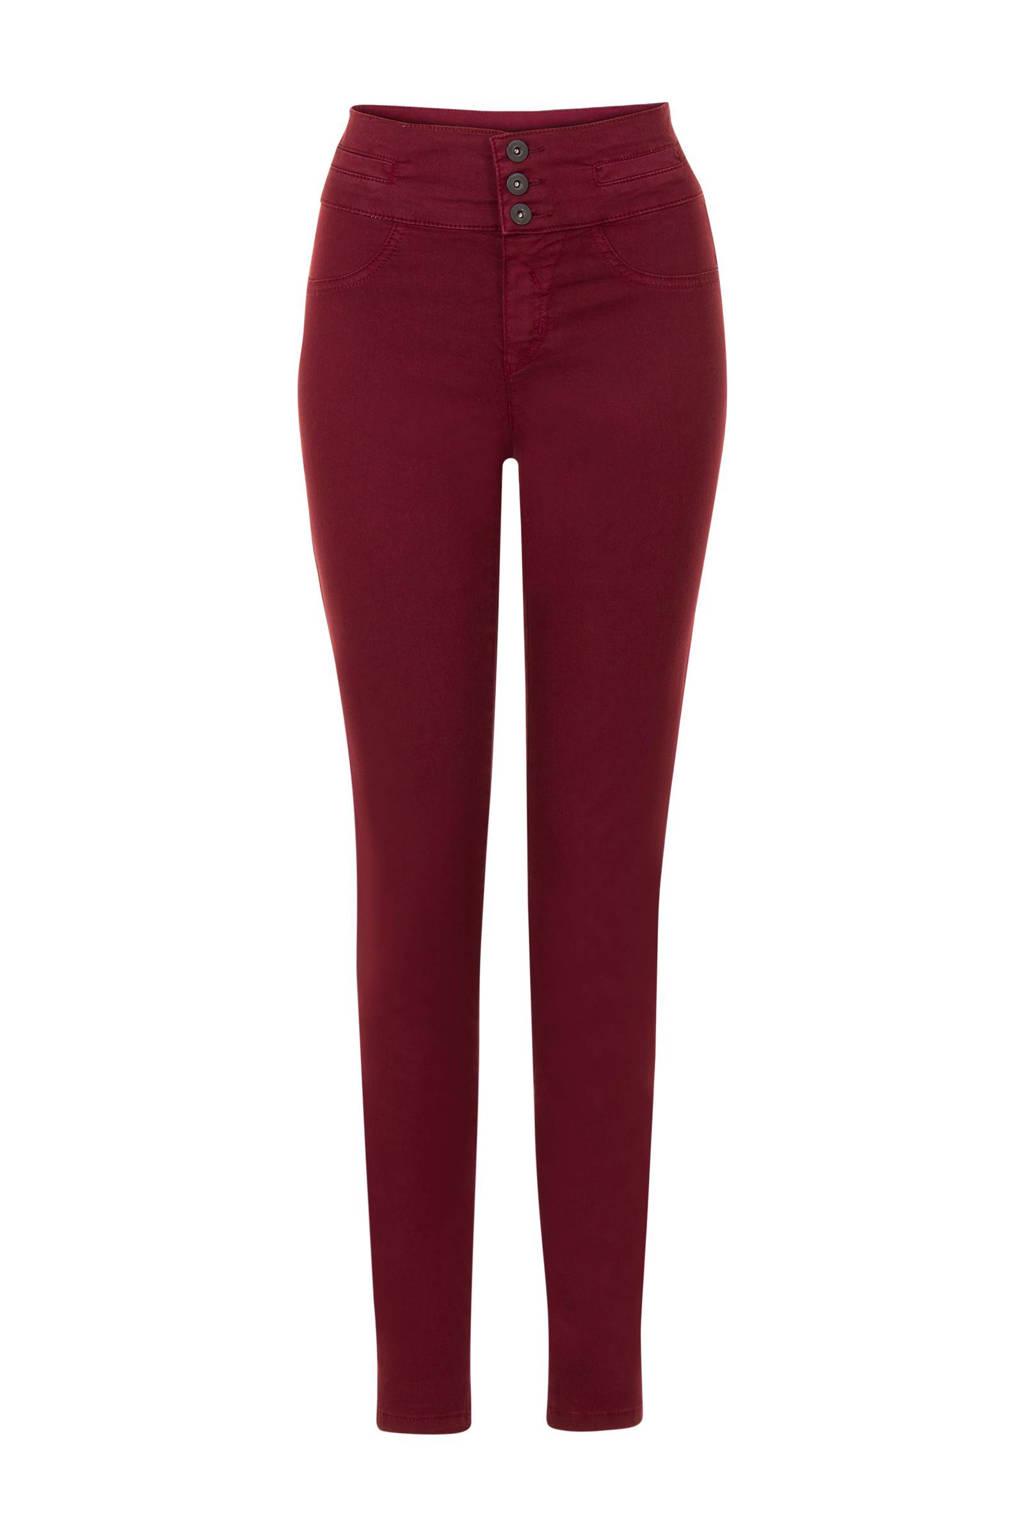 Miss Etam Regulier high waisted slim fit broek 32 inch, Donkerrood